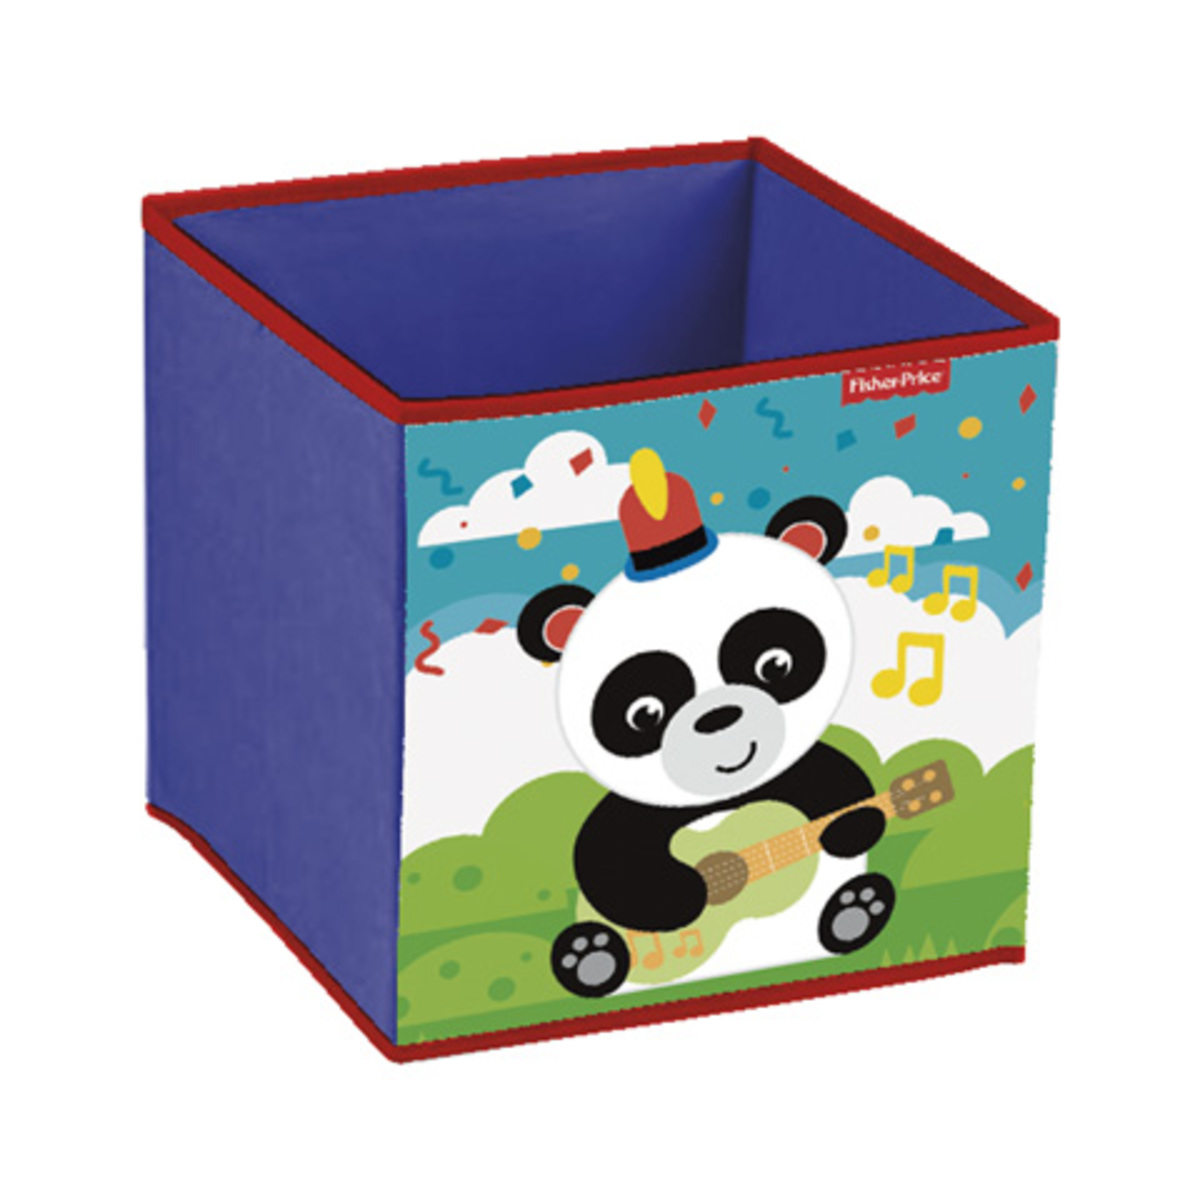 Dětský látkový úložný box Fisher Price Panda